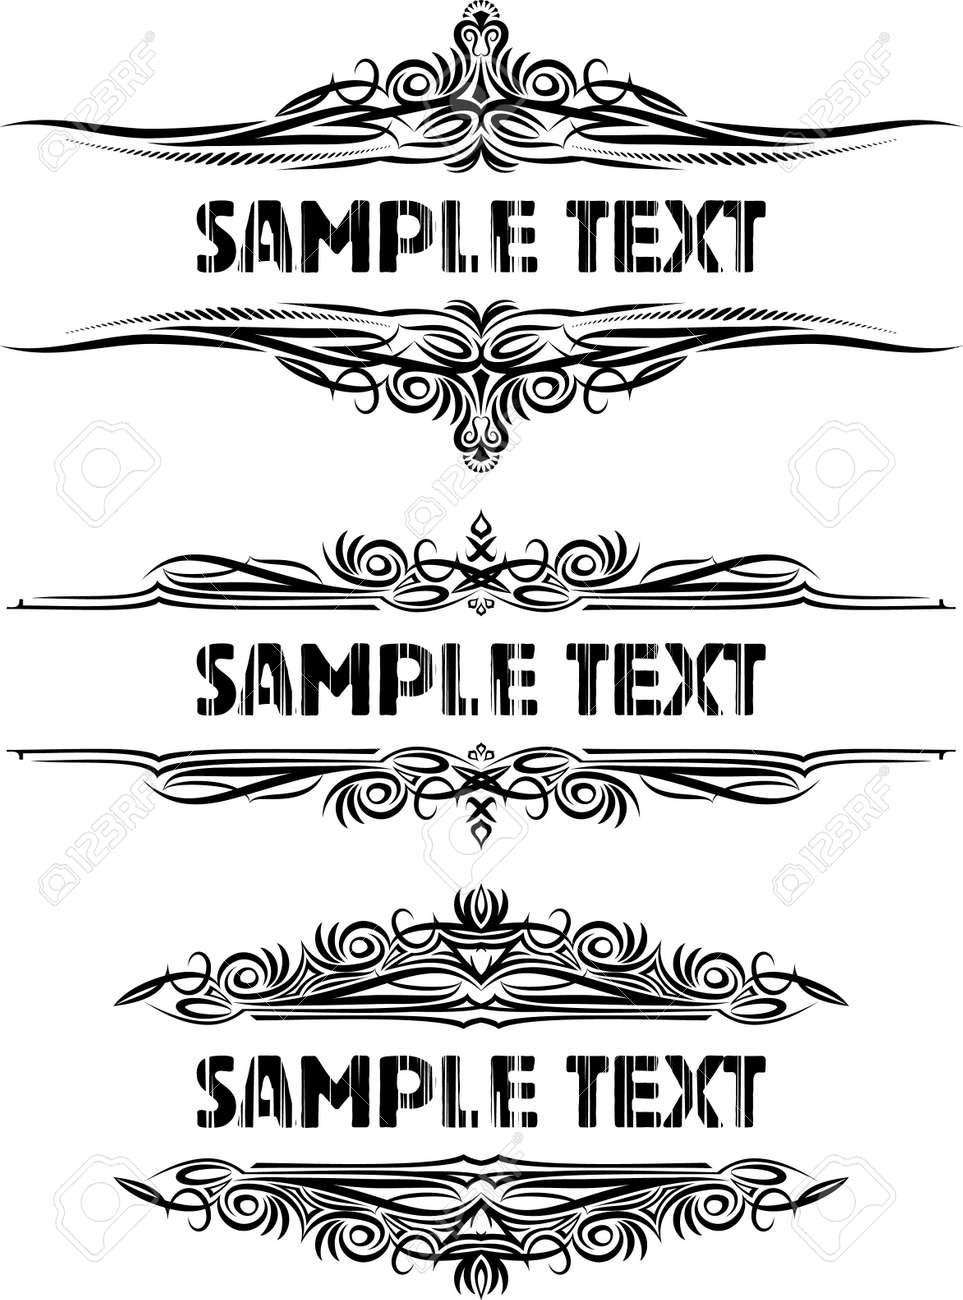 Elegant texts frames. Stock Vector - 10707446